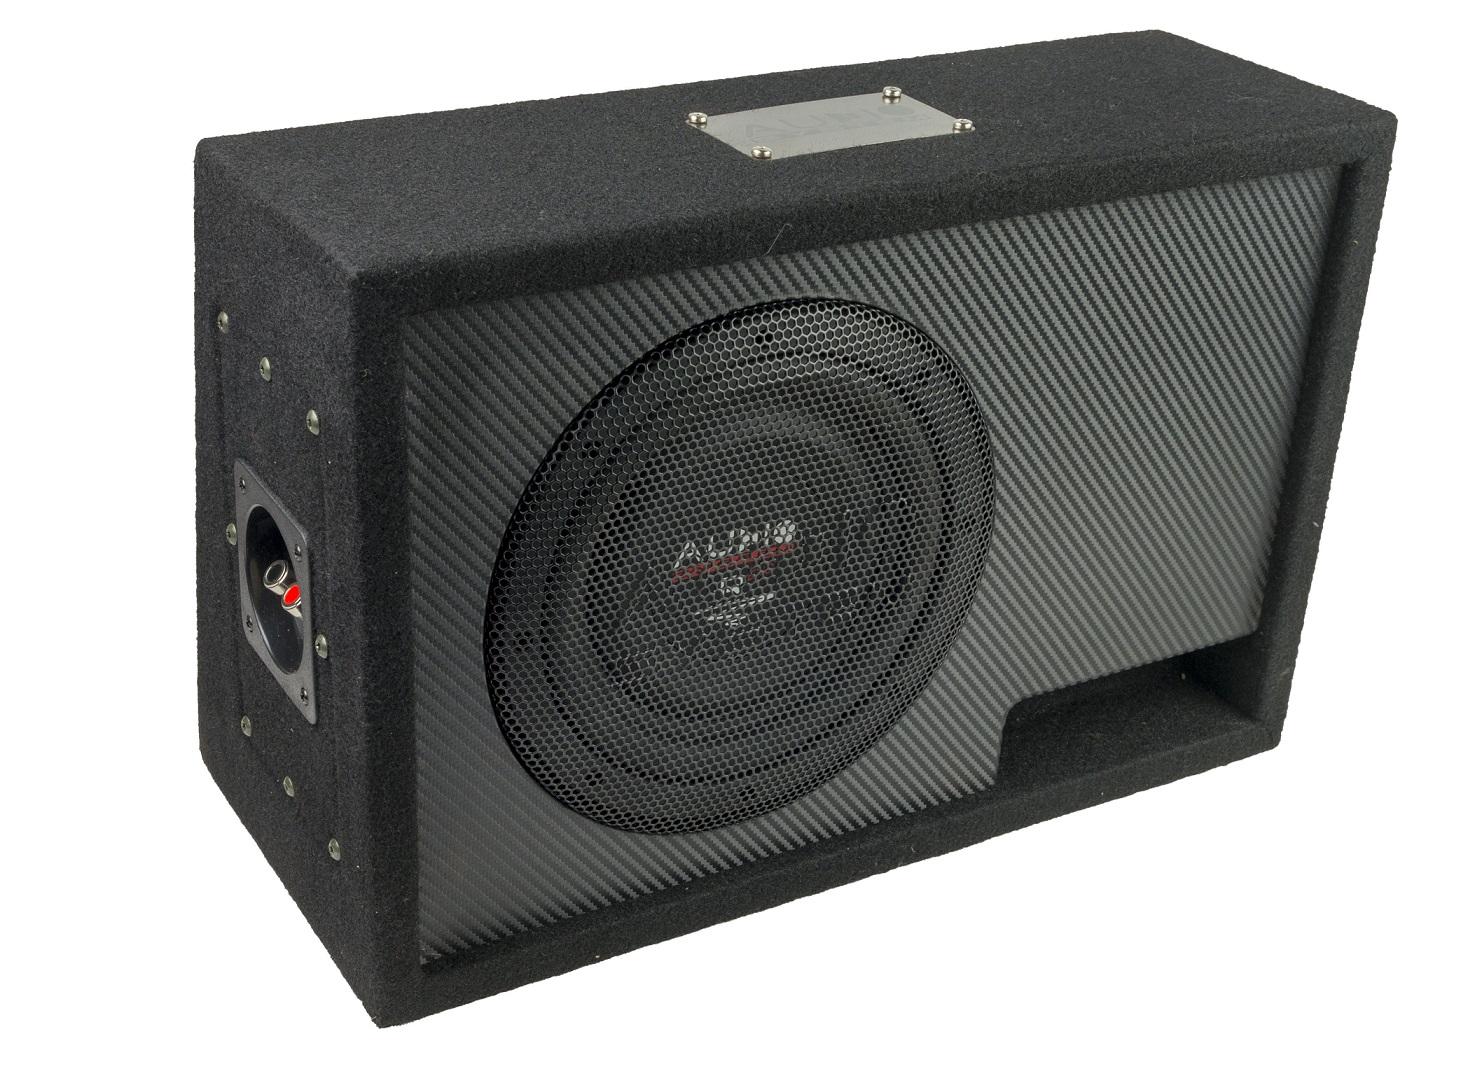 Audio System R 08 FLAT BR ACTIVE EVO Bassreflexgehäuse R 08 FLAT EVO + CO-200.1 aktiver Subwoofer